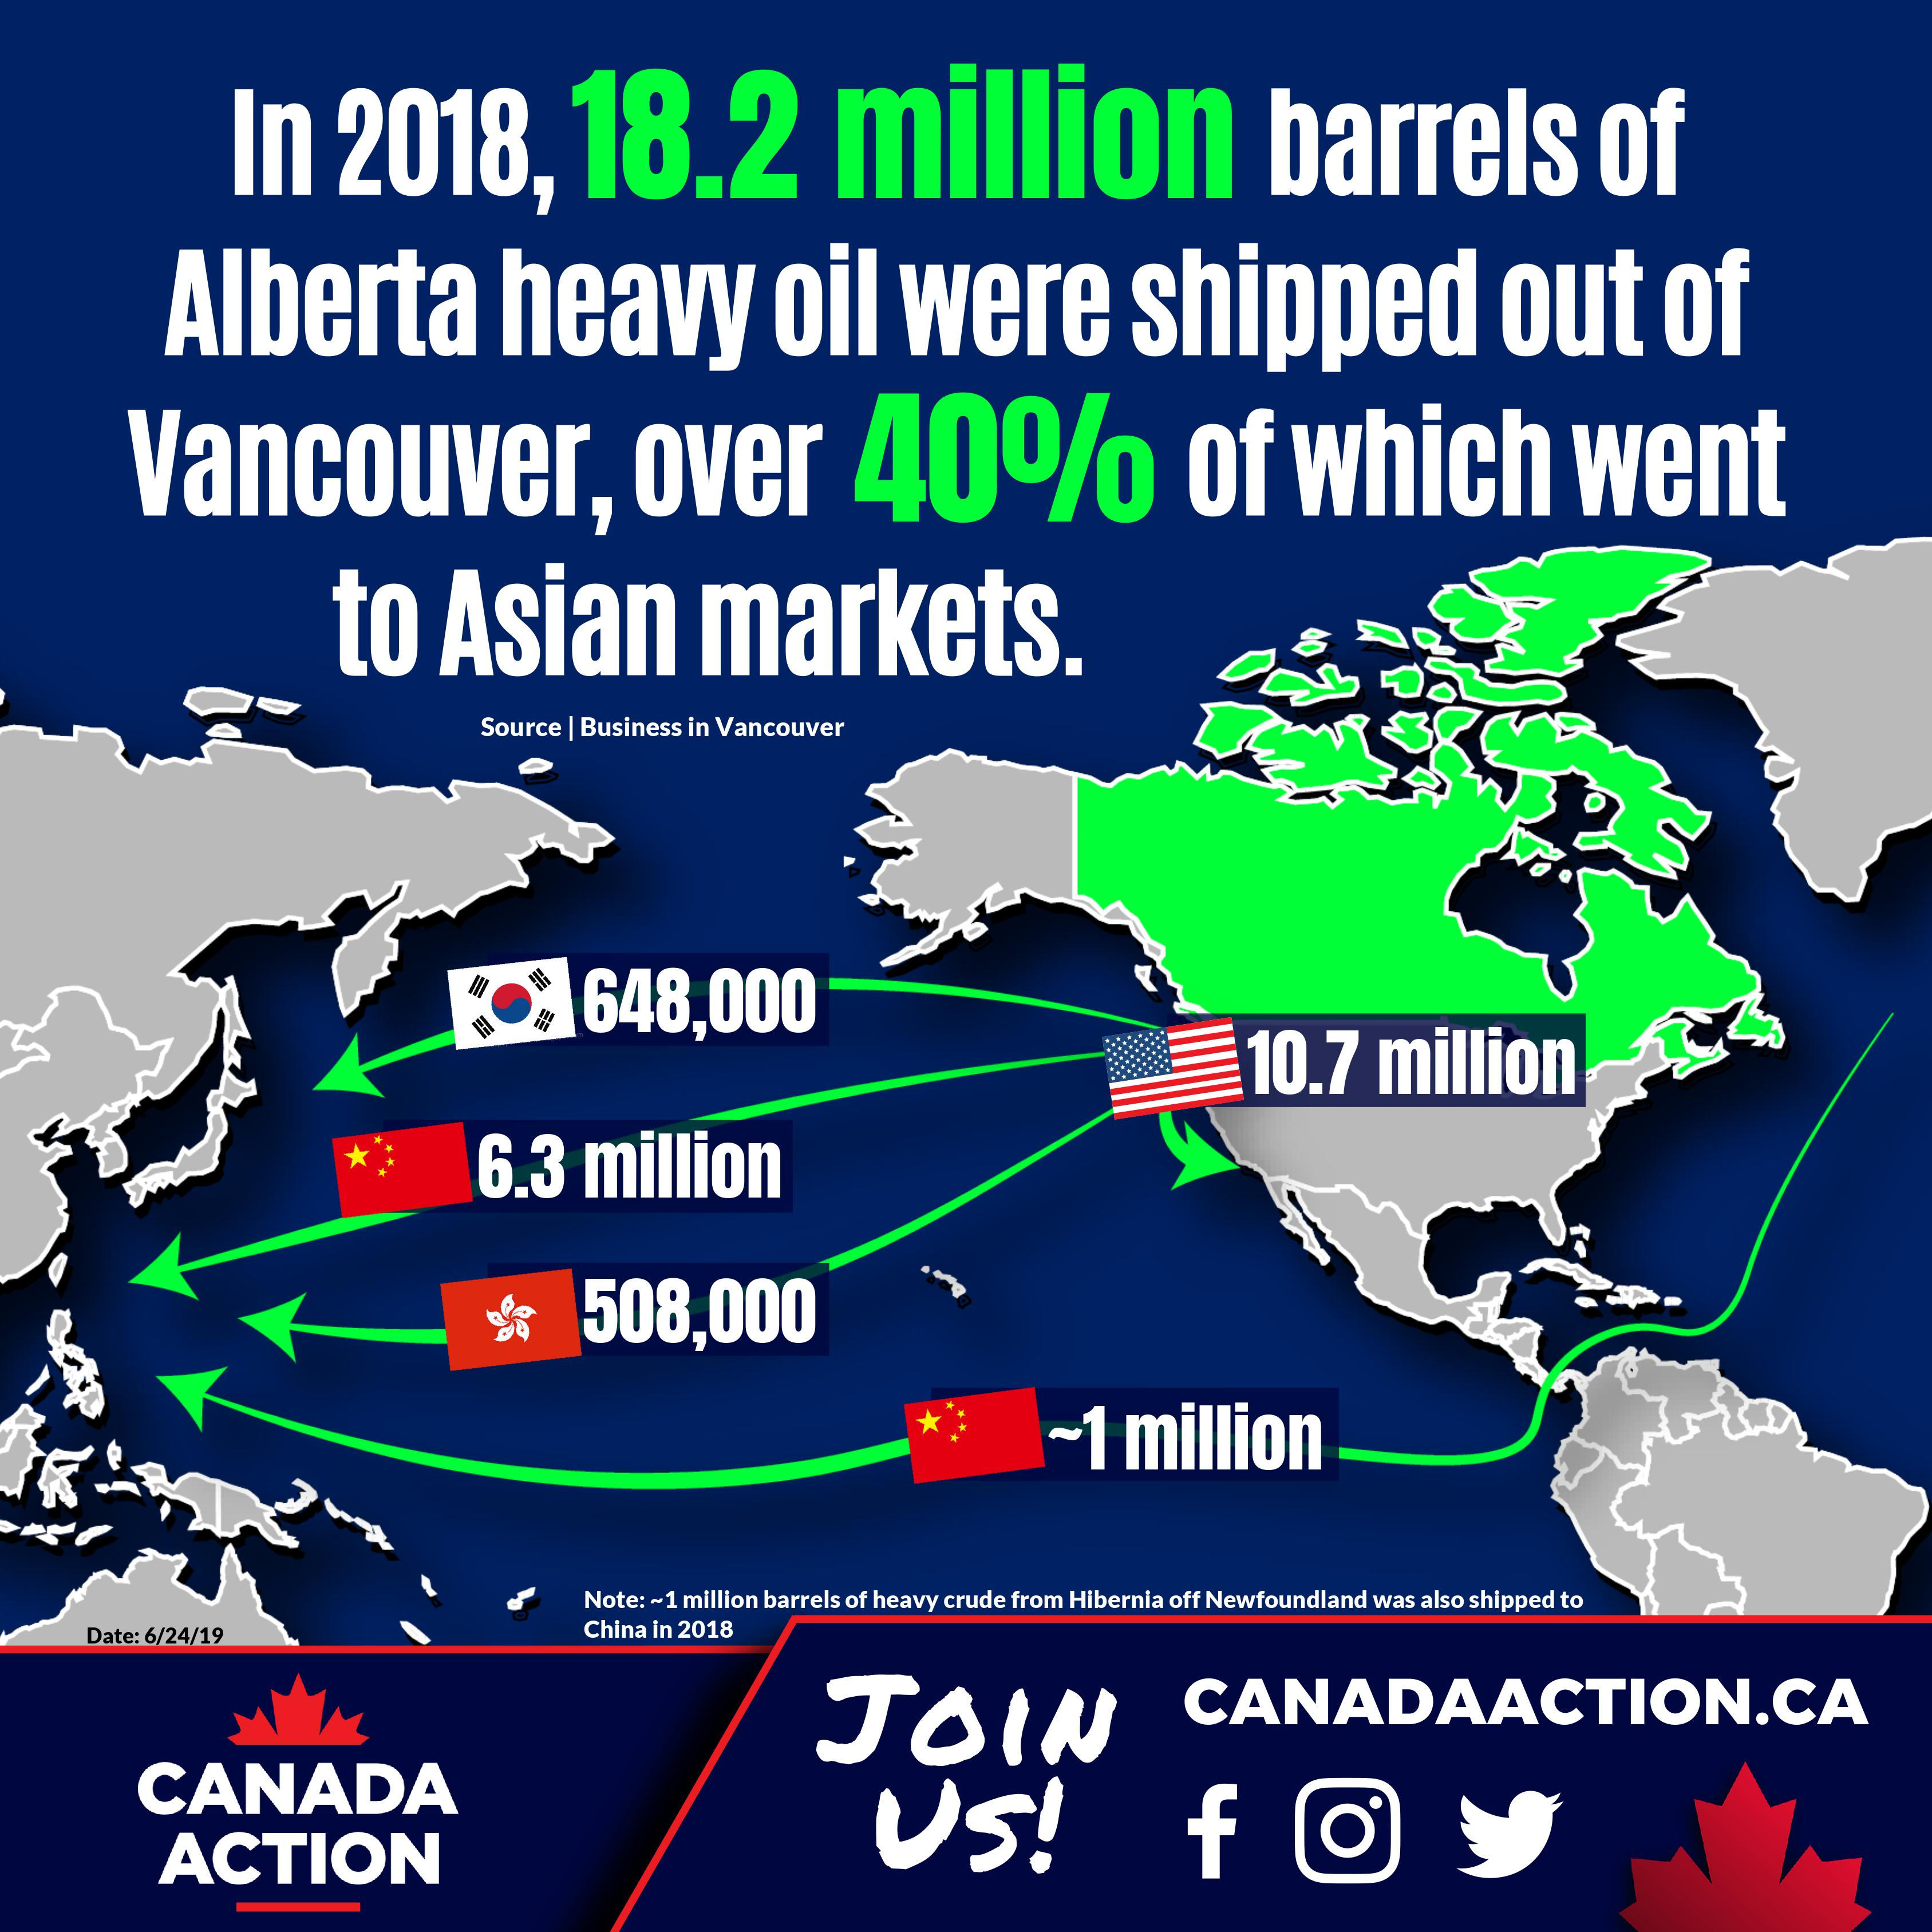 Alberta crude oil shipped via Tanker to China, South Korea, Hong Kong, America in 2018